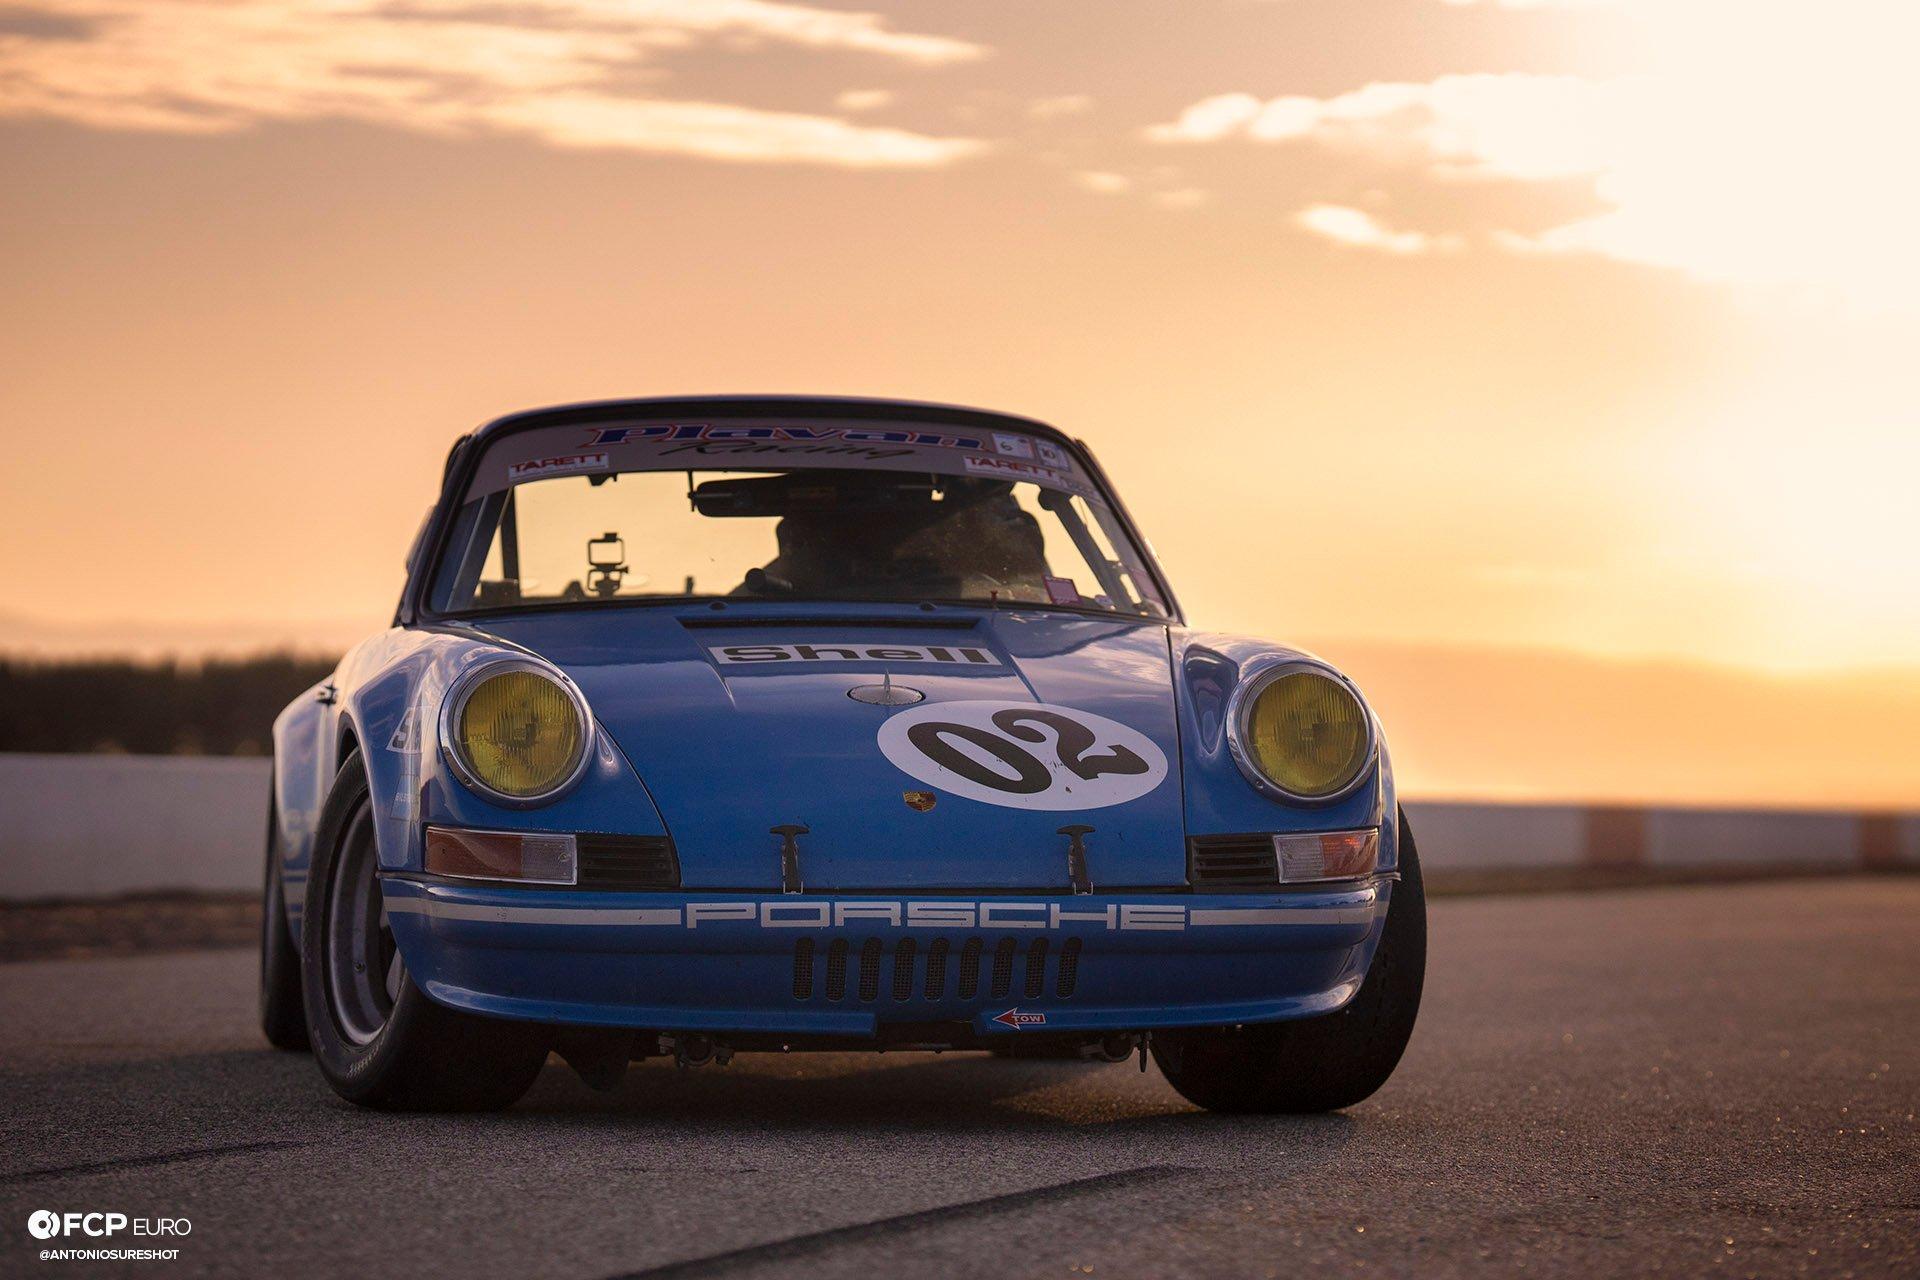 Porsche 911 Longnose VARA Patrick Long Chad Plavan EOSR9399